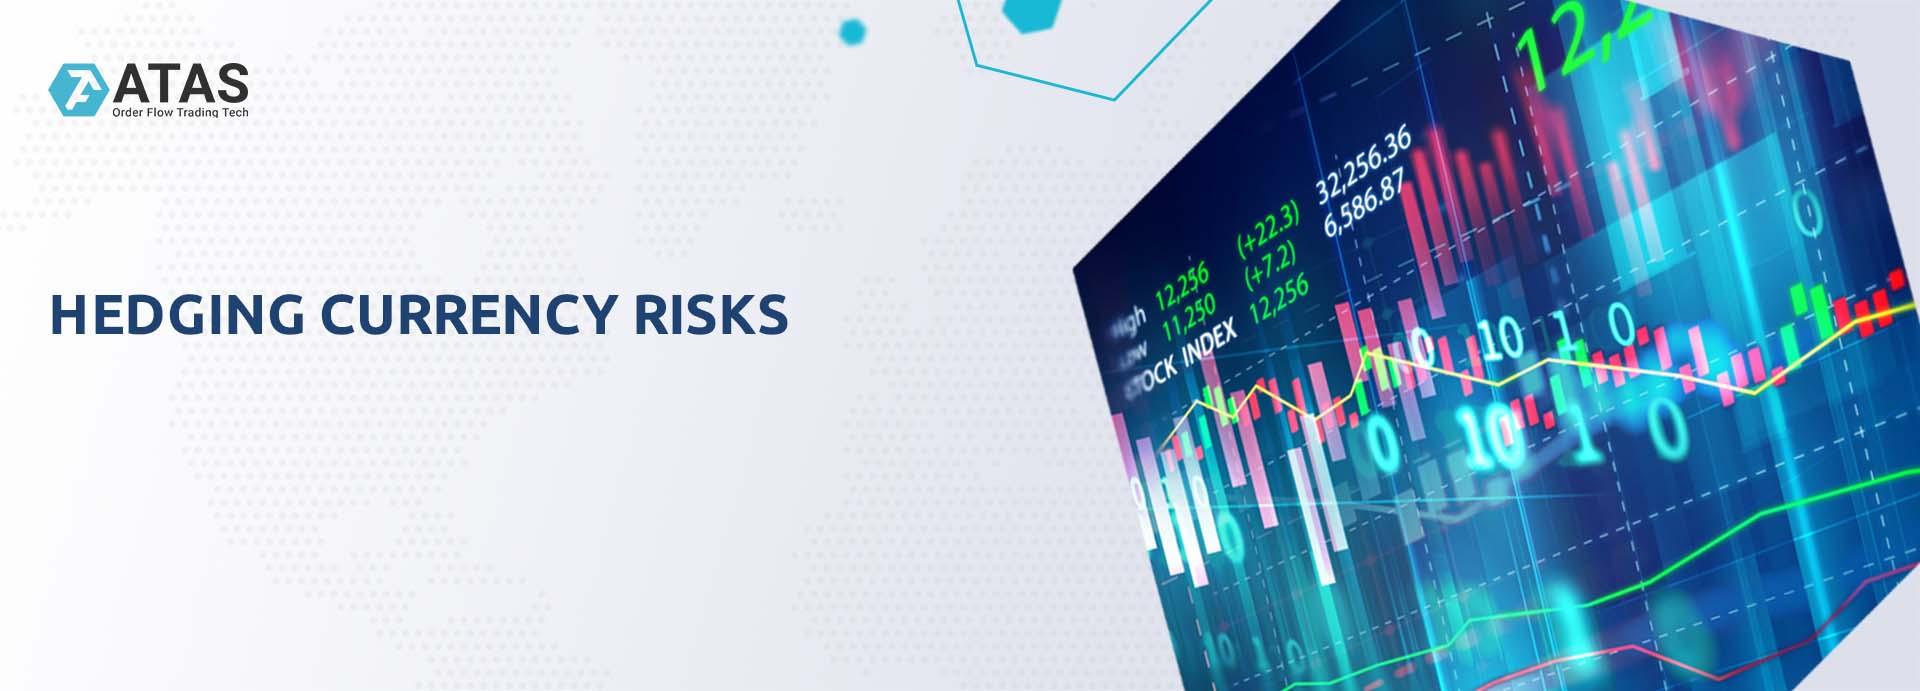 Hedging currency risks